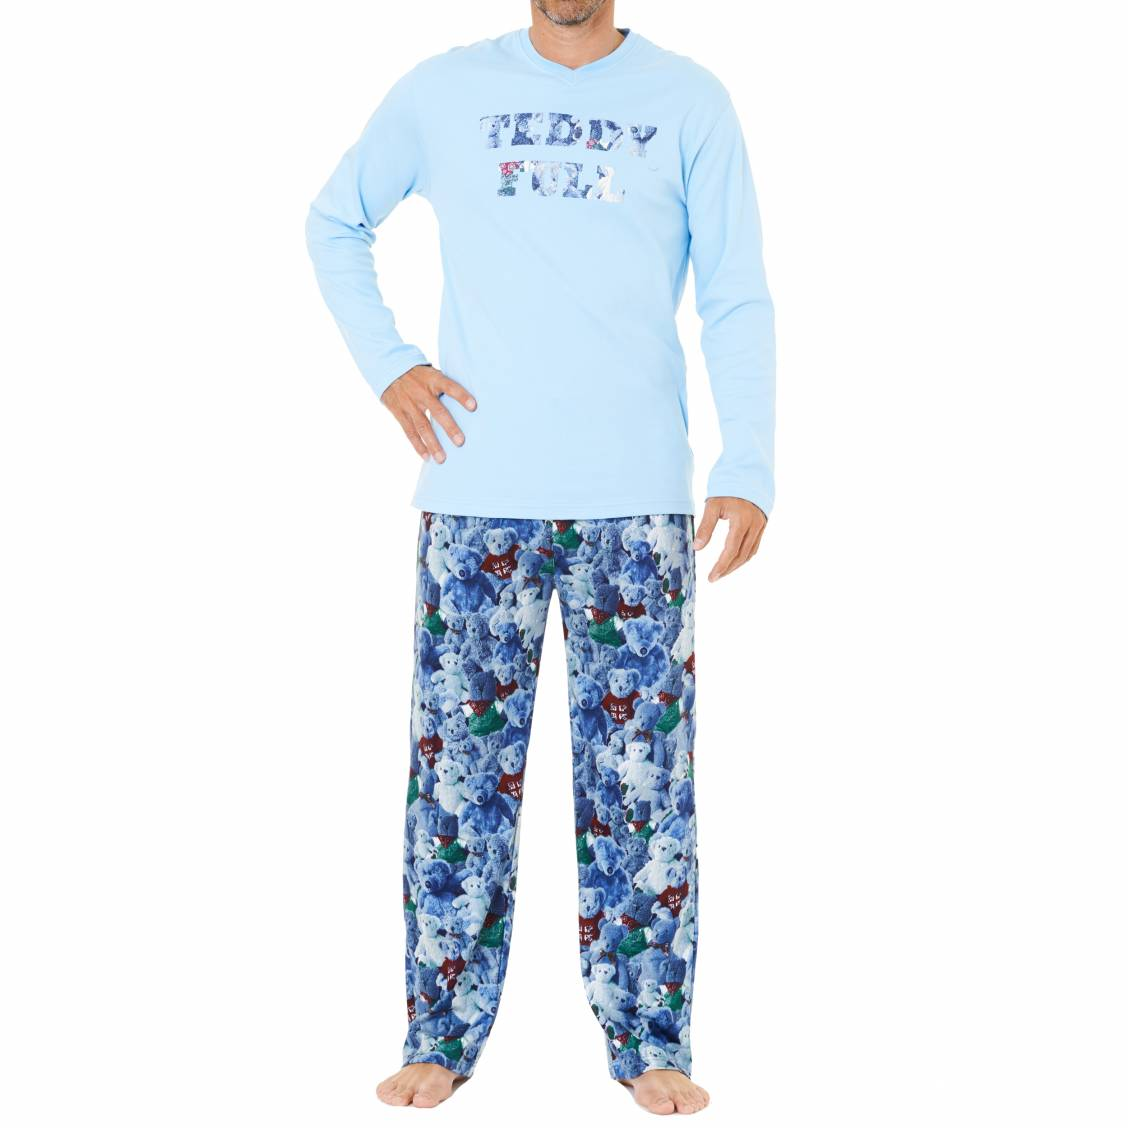 Pyjama chaud arthur tee shirt manches longues bleu ciel for Pyjama homme chaud